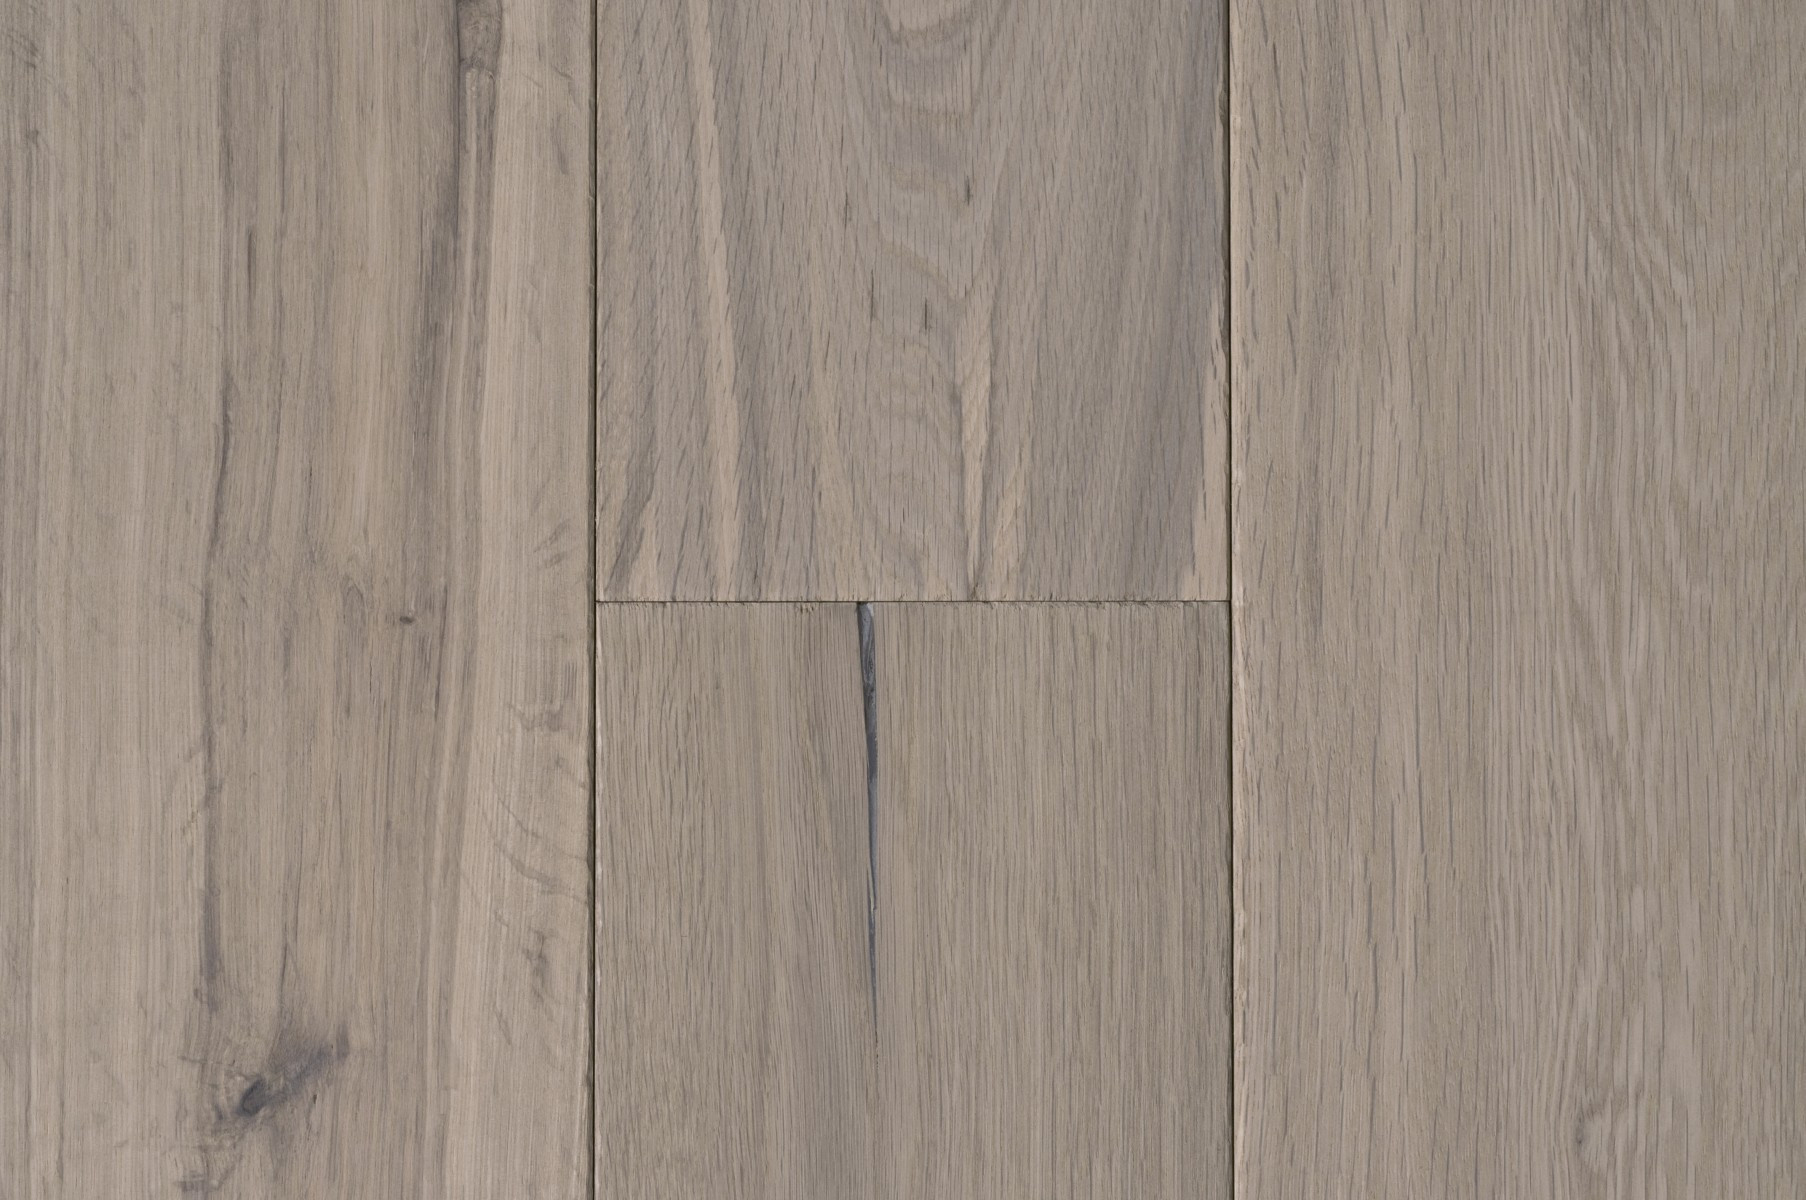 Distressed Hardwood Flooring Prices Of Duchateau Hardwood Flooring Houston Tx Discount Engineered Wood Inside Hardwood Floors A· Antique White European Oak